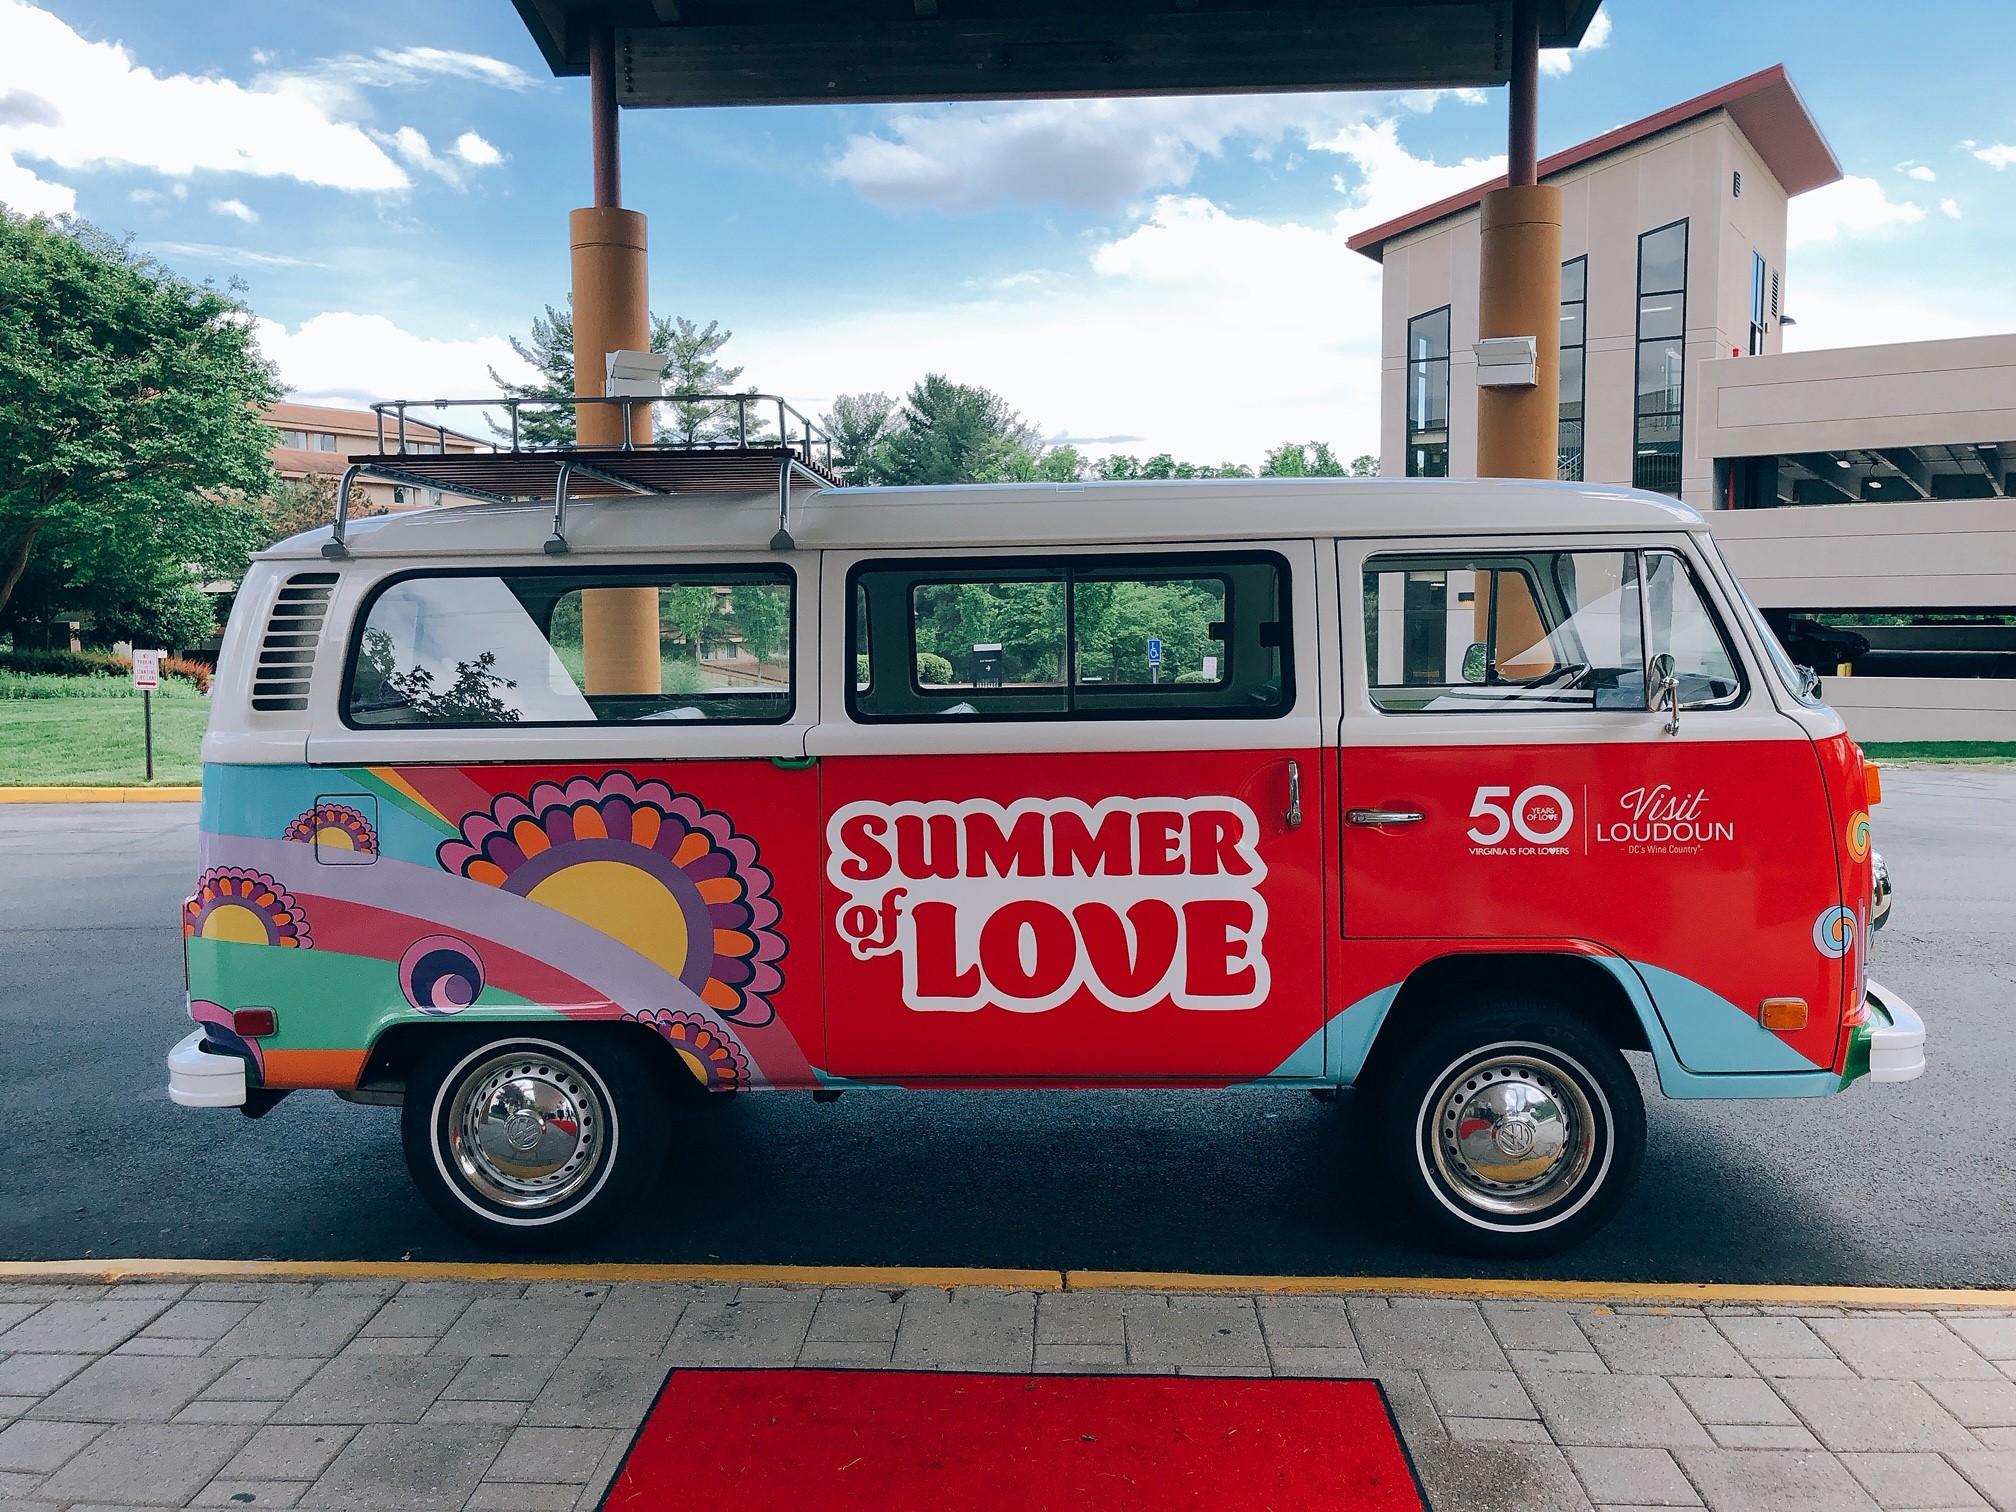 VW Loudoun 50 Years of Love bus